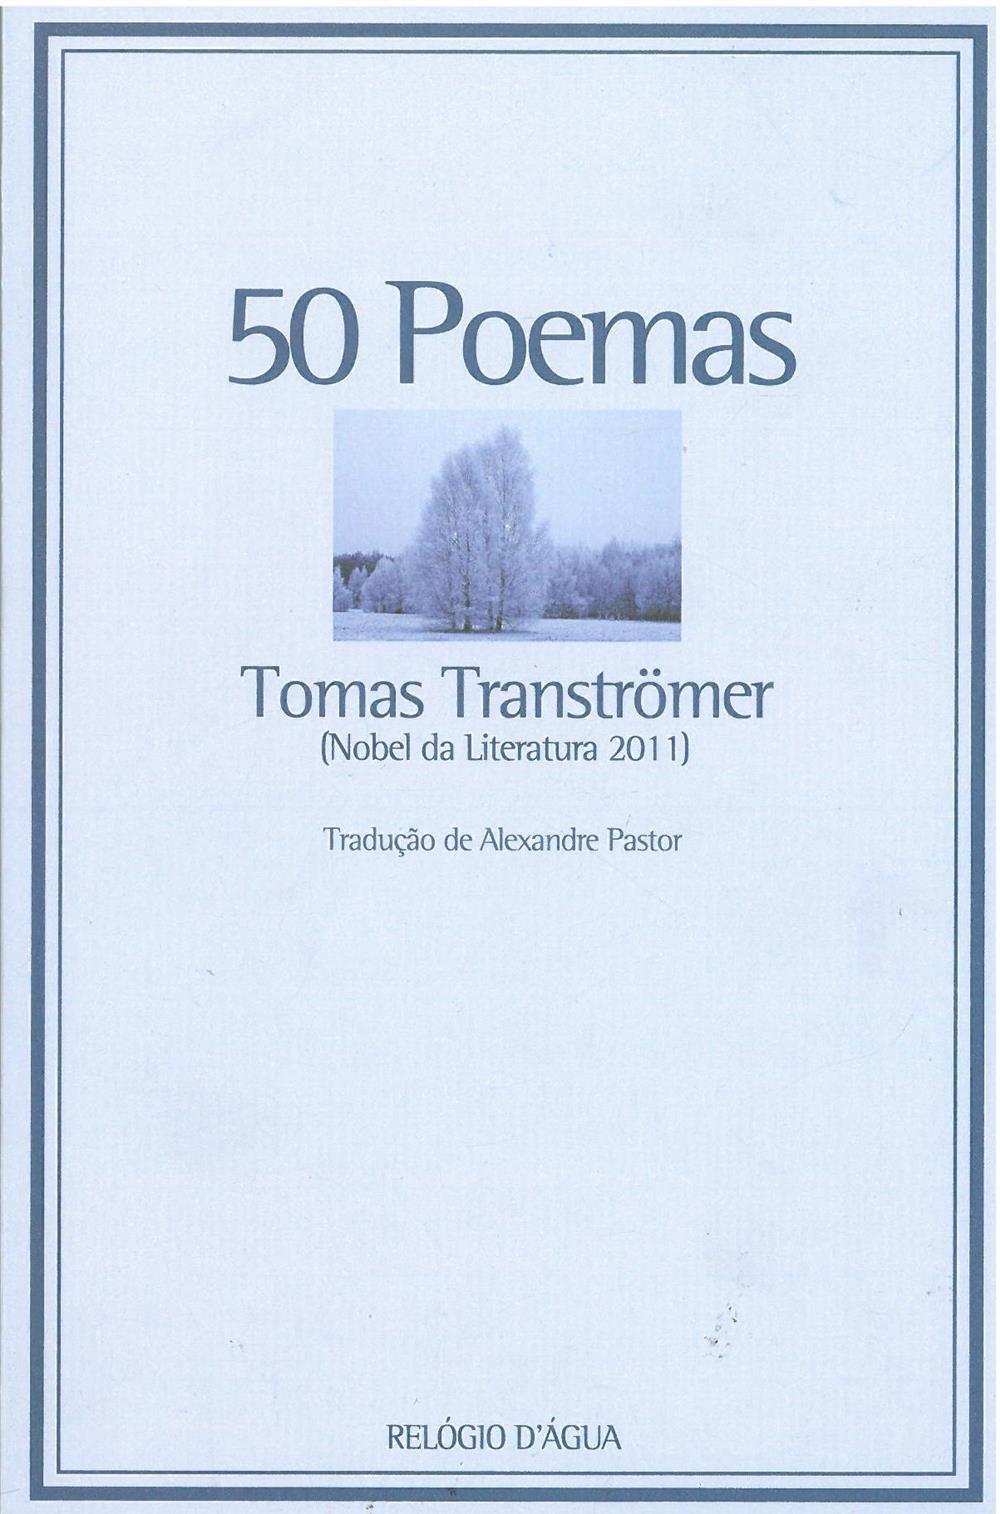 50 poemas_.jpg